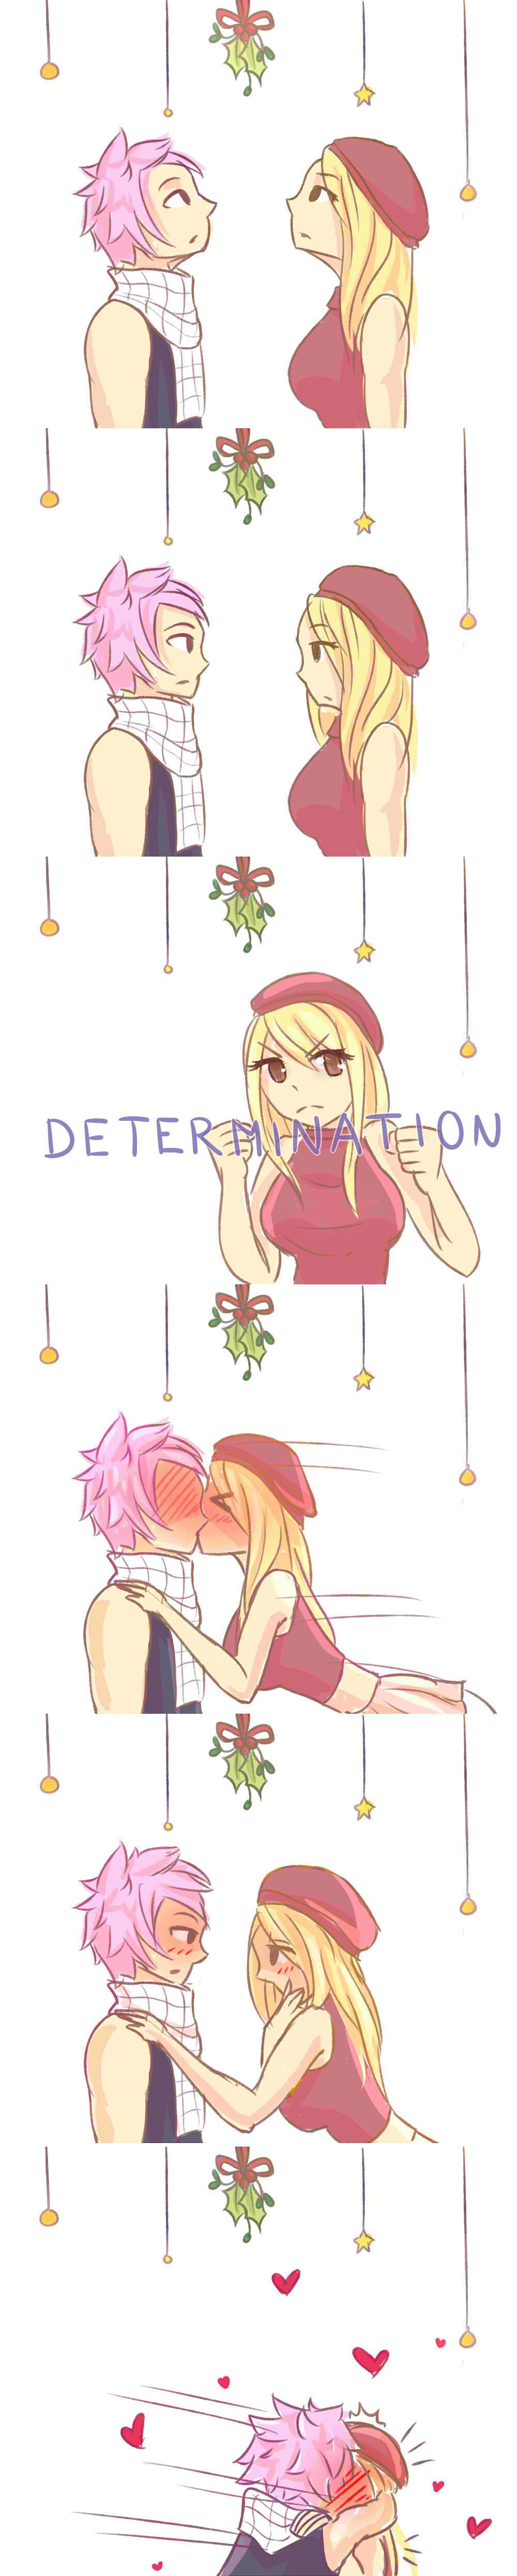 Under the Mistletoe by hazu-i